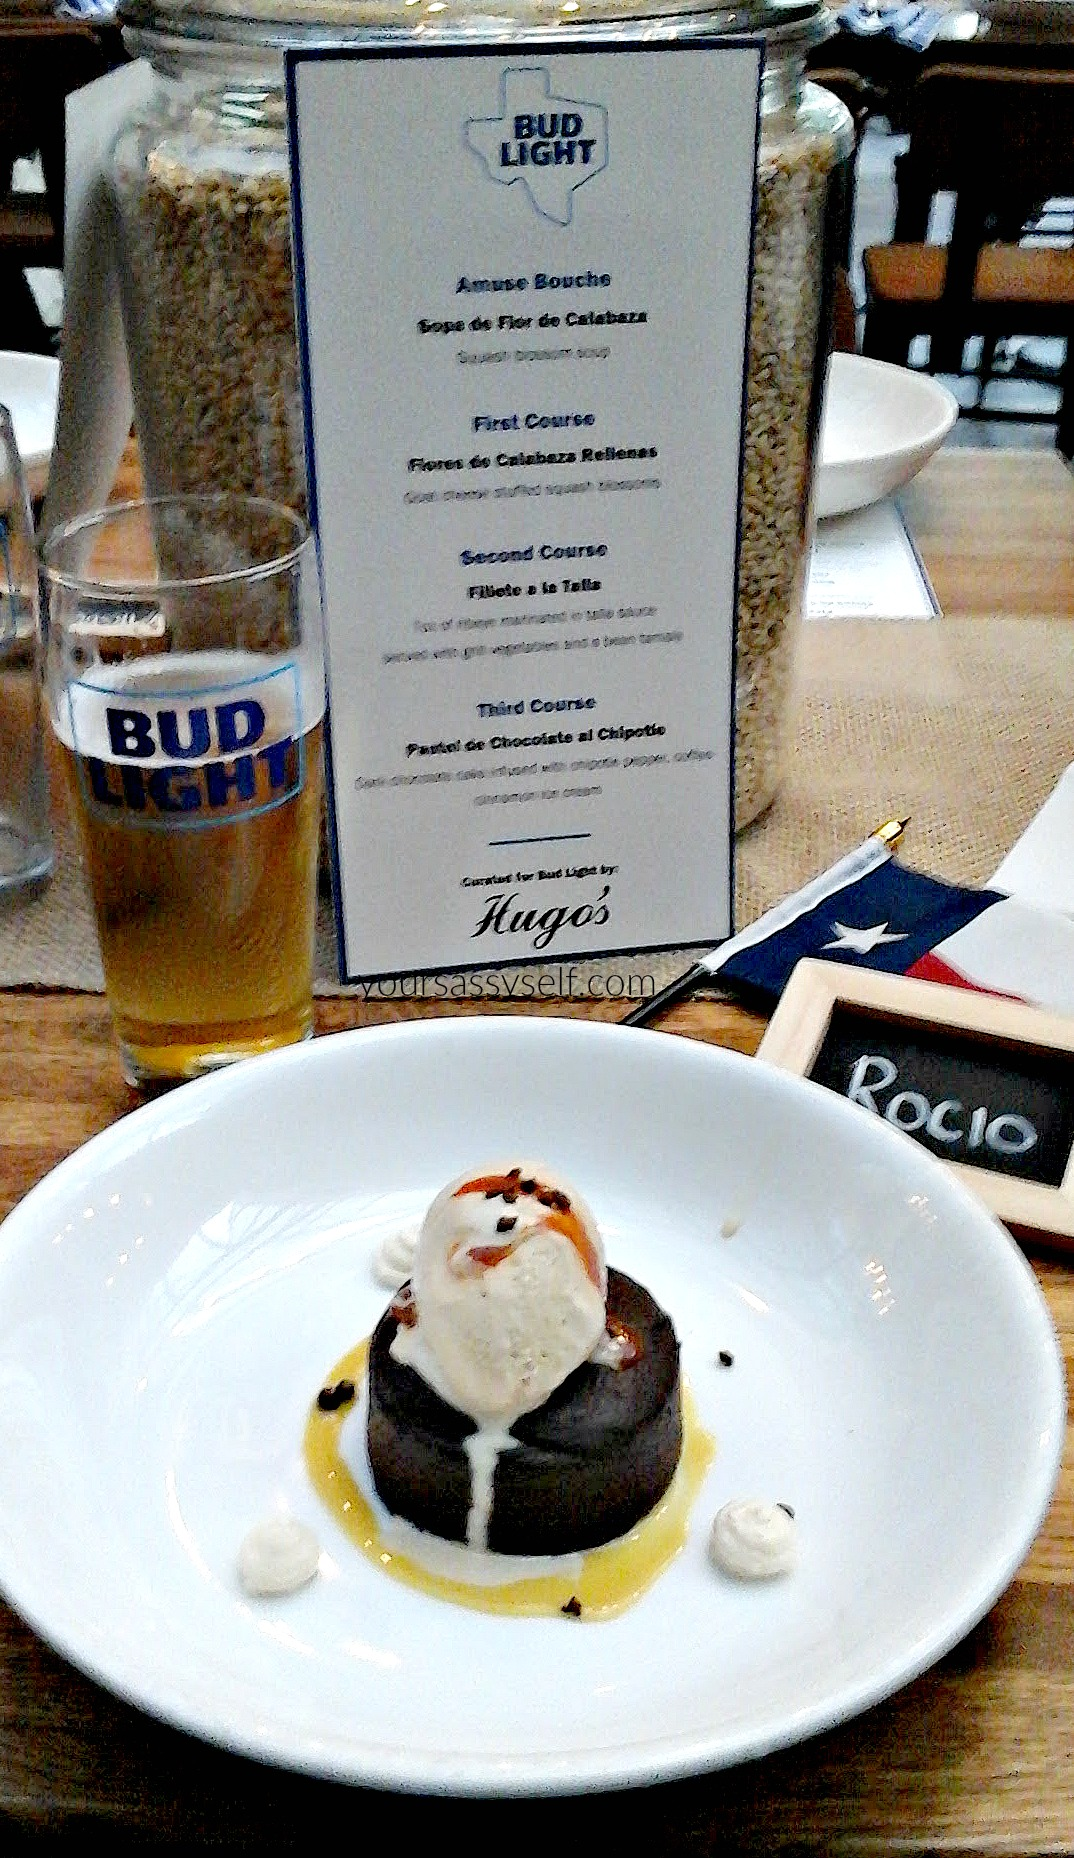 Bud Light Pairing with Chocolate Chipotle Cake - yoursassyself.com